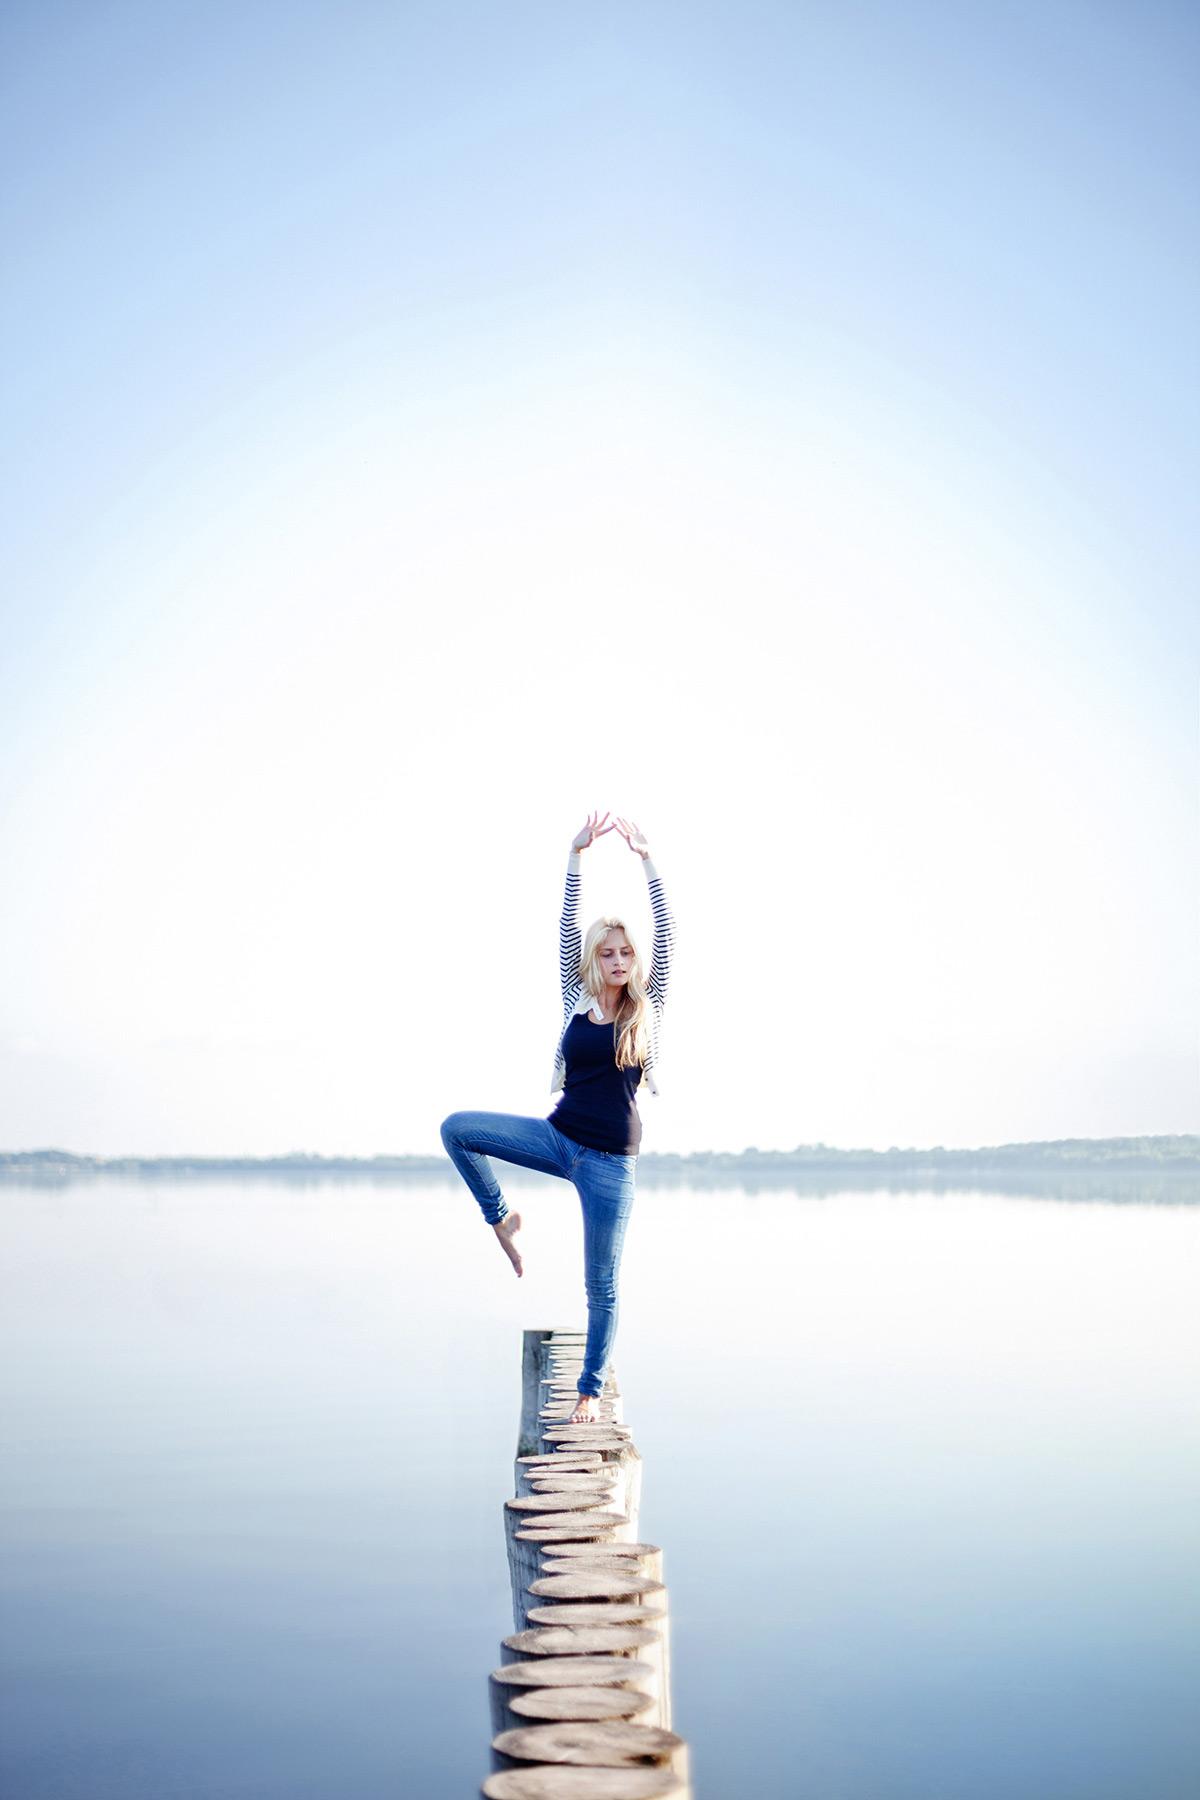 junge Frau steht in Yoga-Pose am See